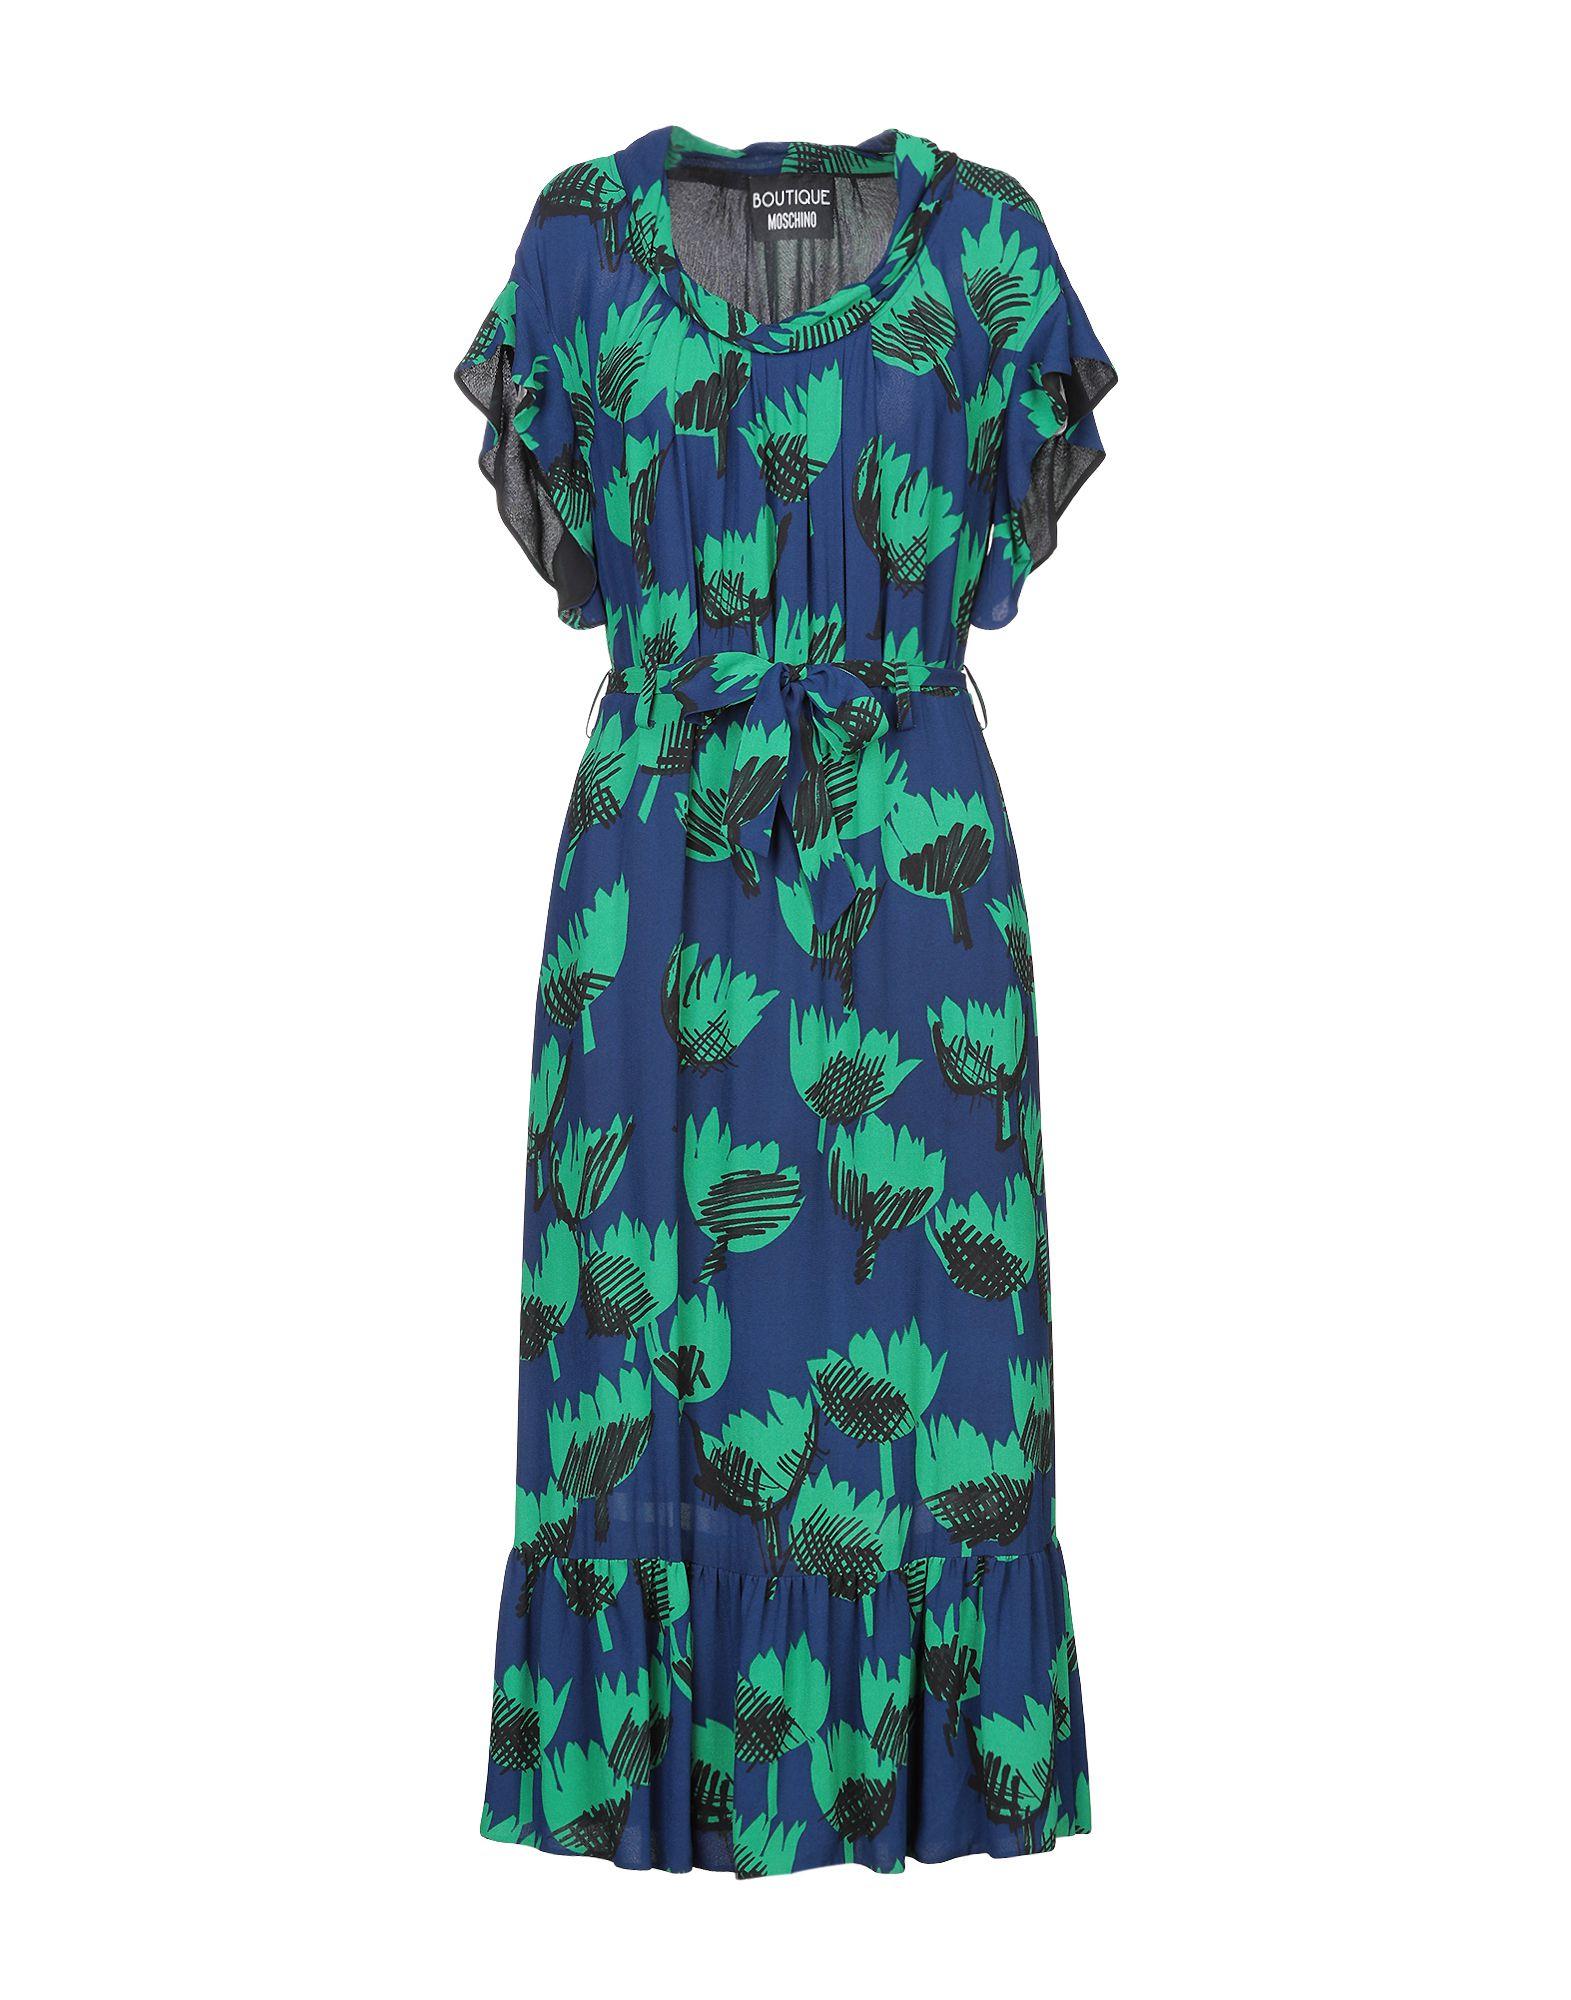 BOUTIQUE MOSCHINO Платье длиной 3/4